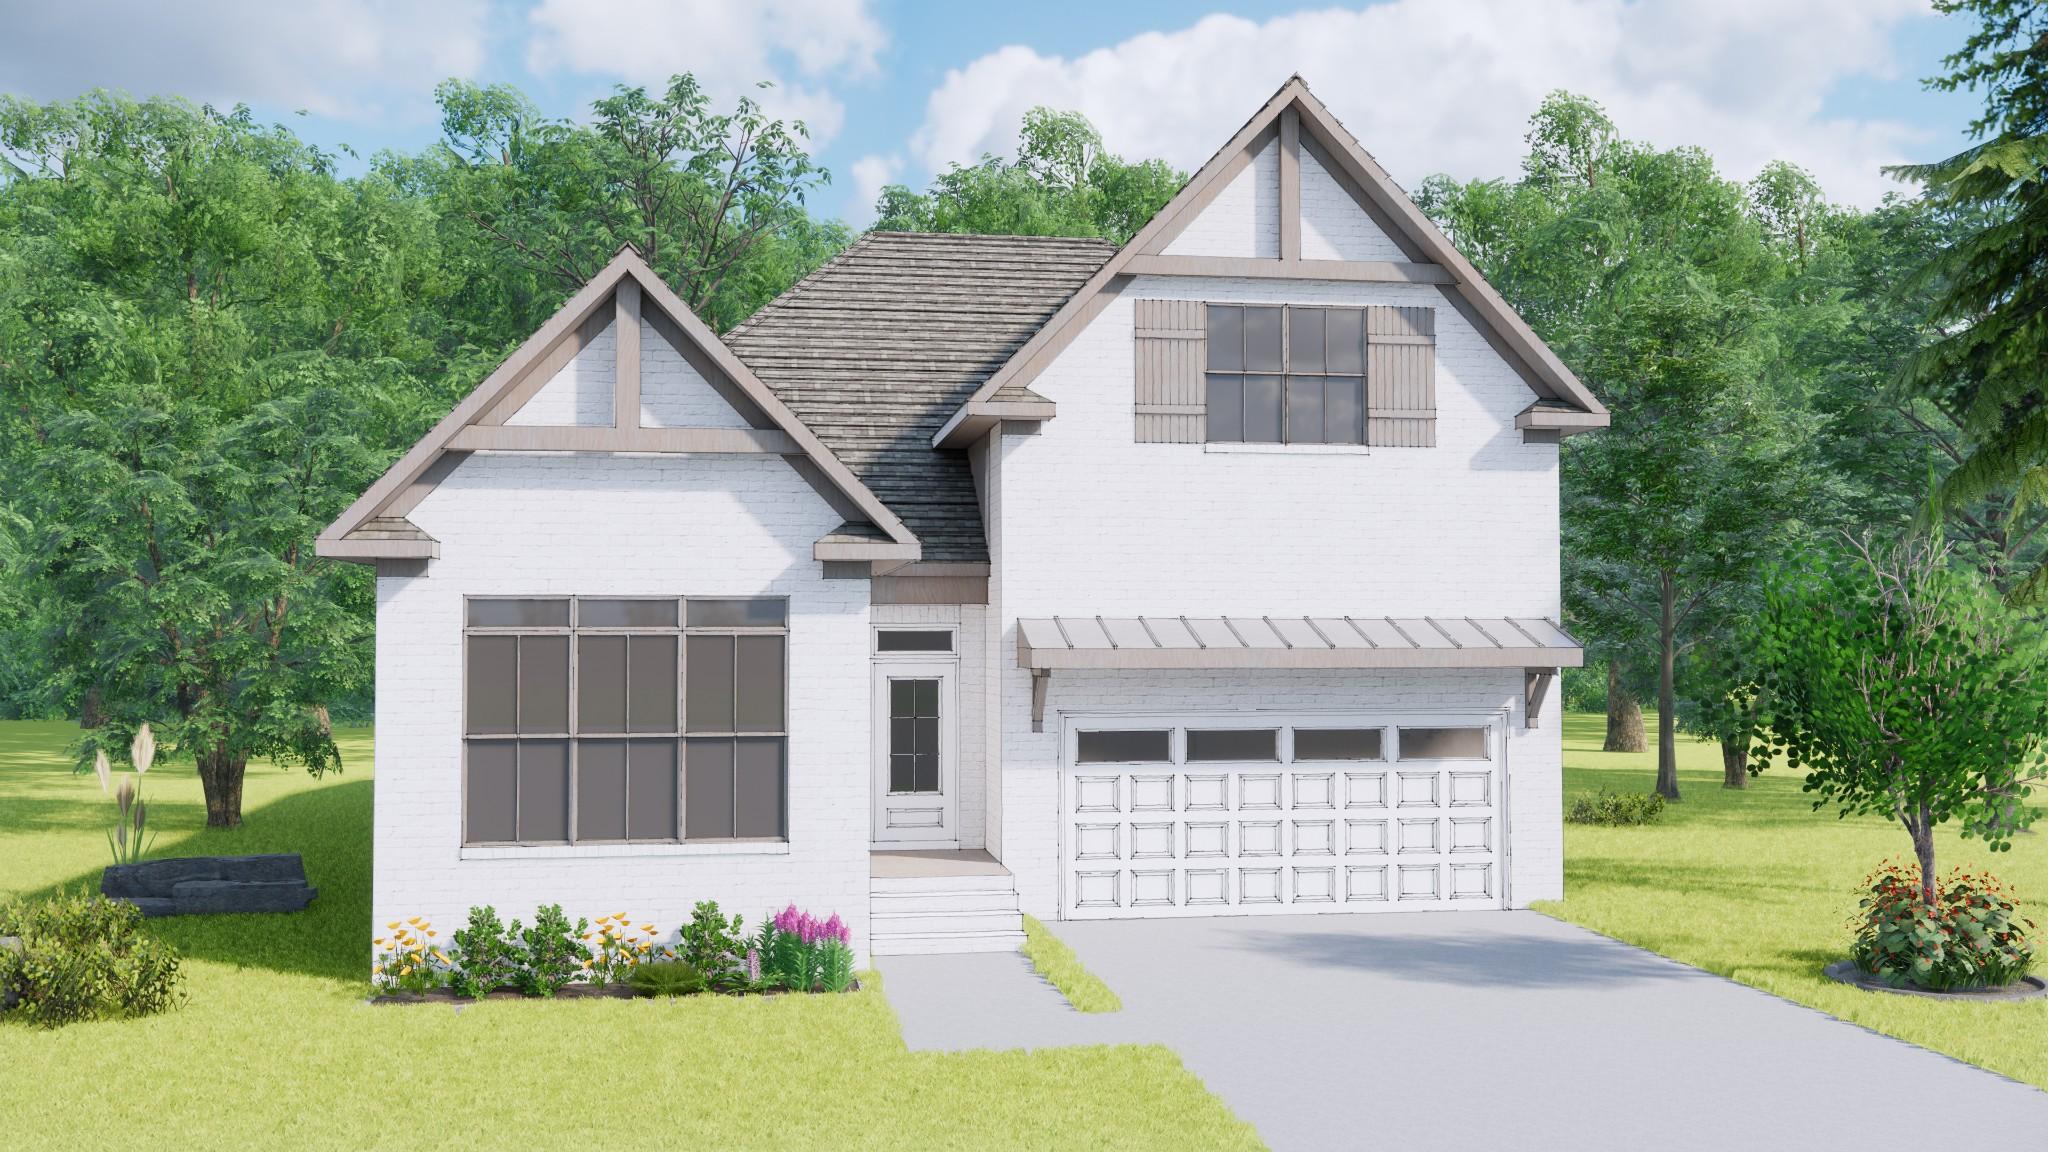 144 Lenham Dr Property Photo - Brentwood, TN real estate listing